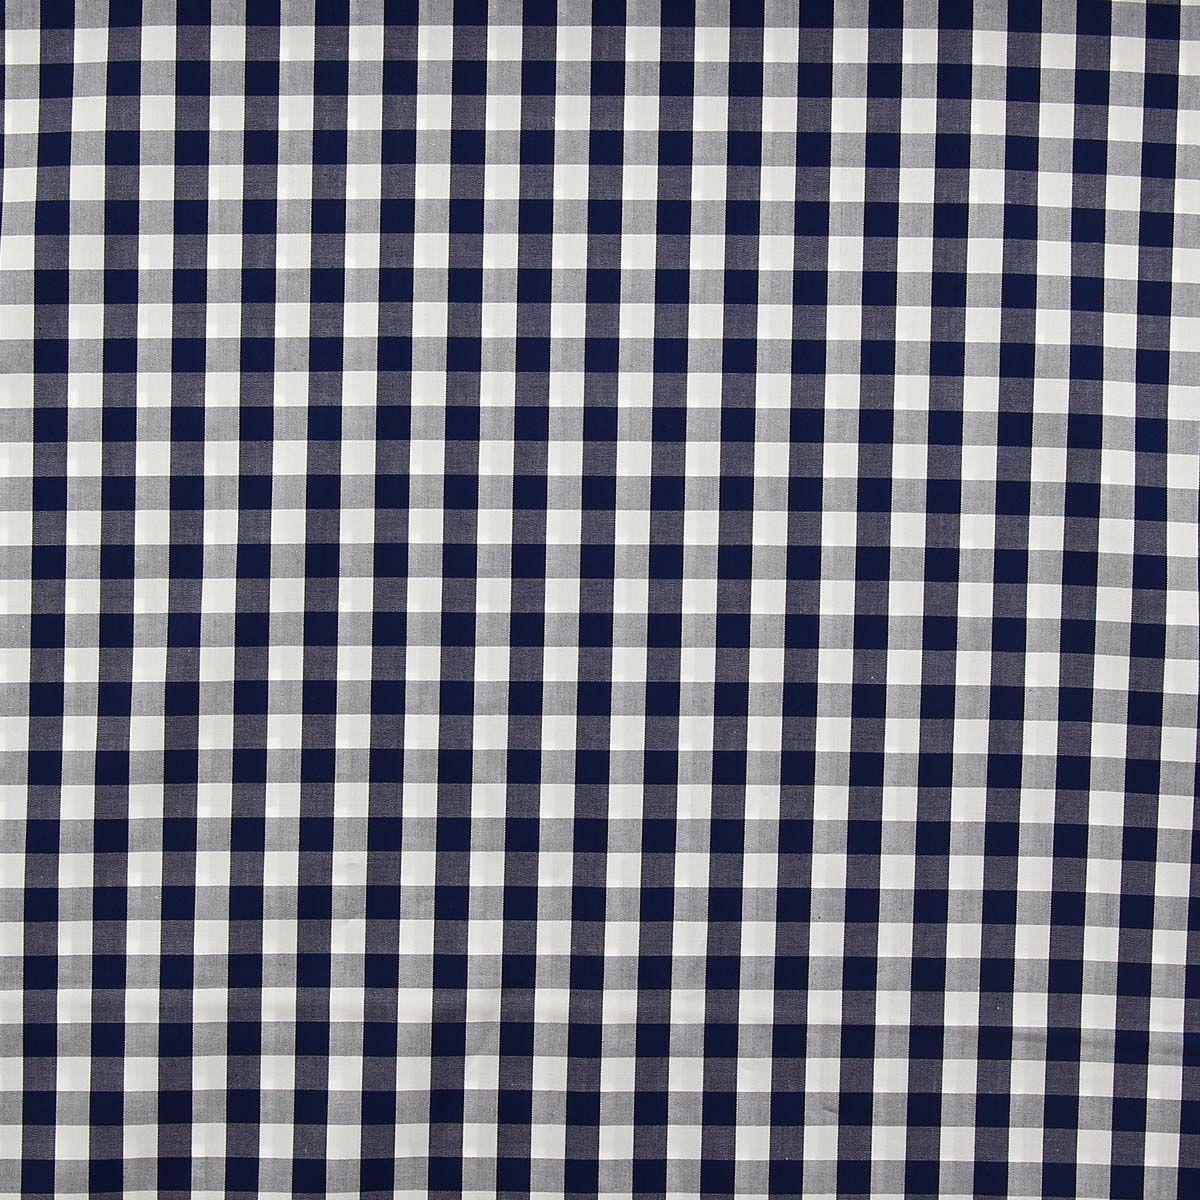 Tissu popeline de coton - Vichy grands carreaux - Bleu marine